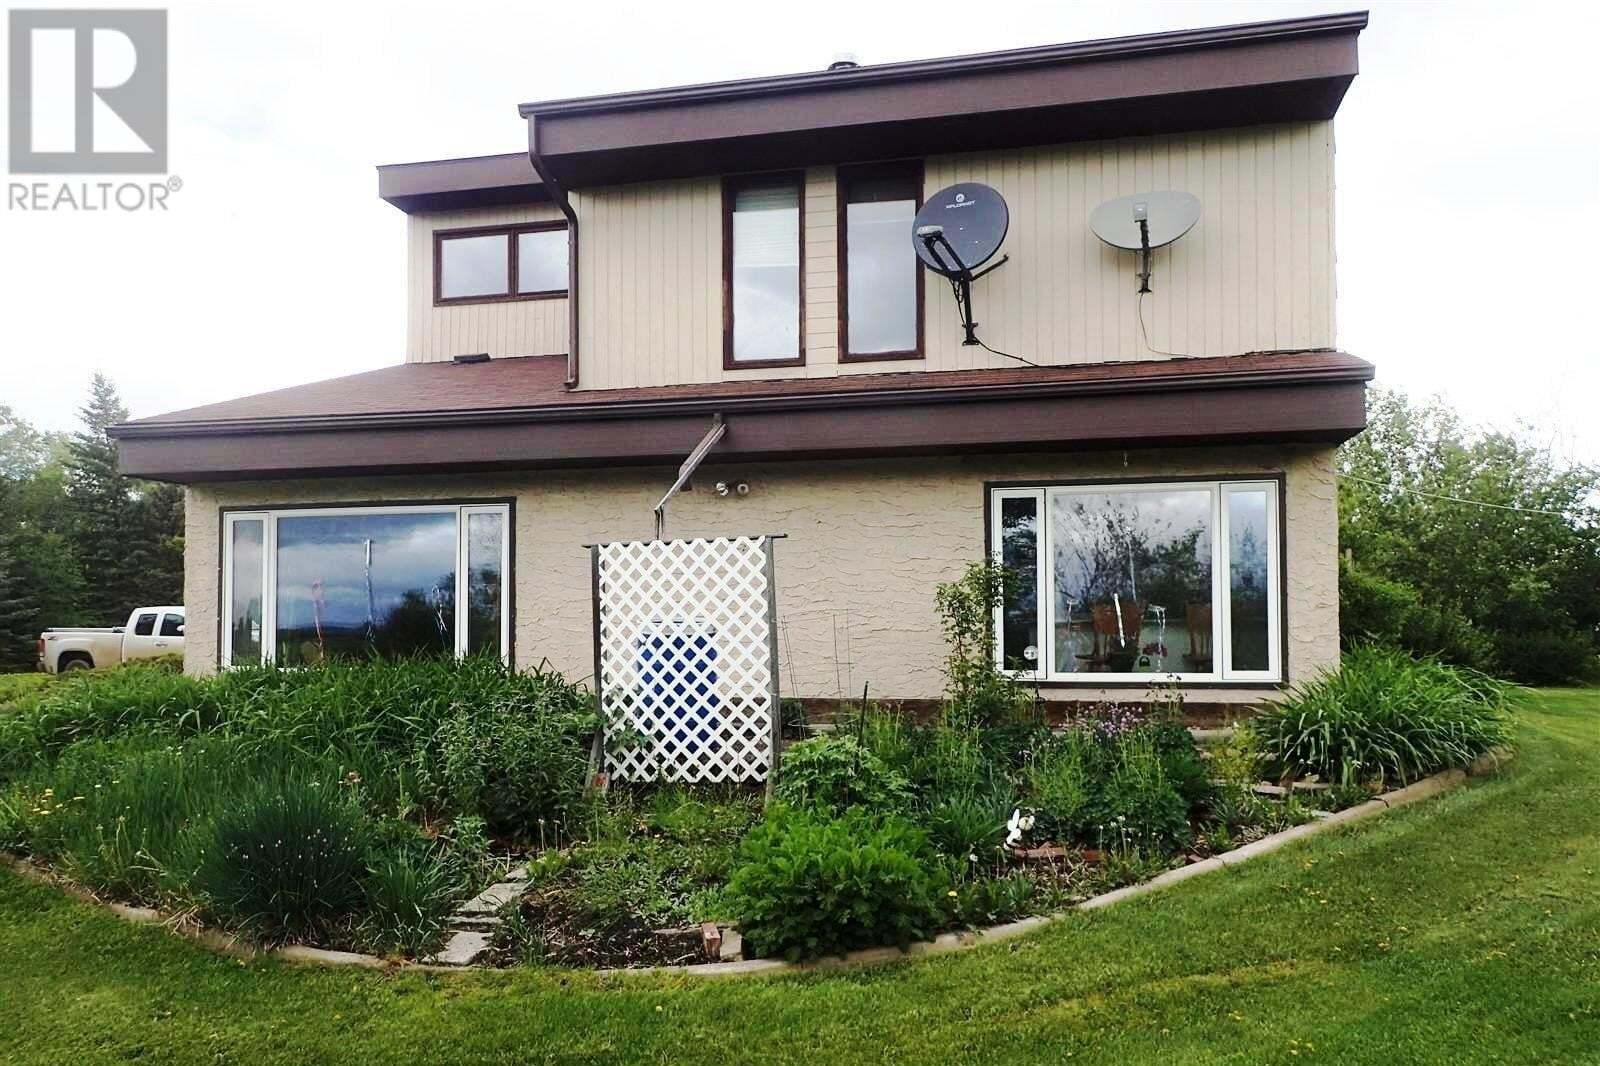 House for sale at 10 Kms Sw Of Meadow Lk Meadow Lake Rm No.588 Saskatchewan - MLS: SK813919